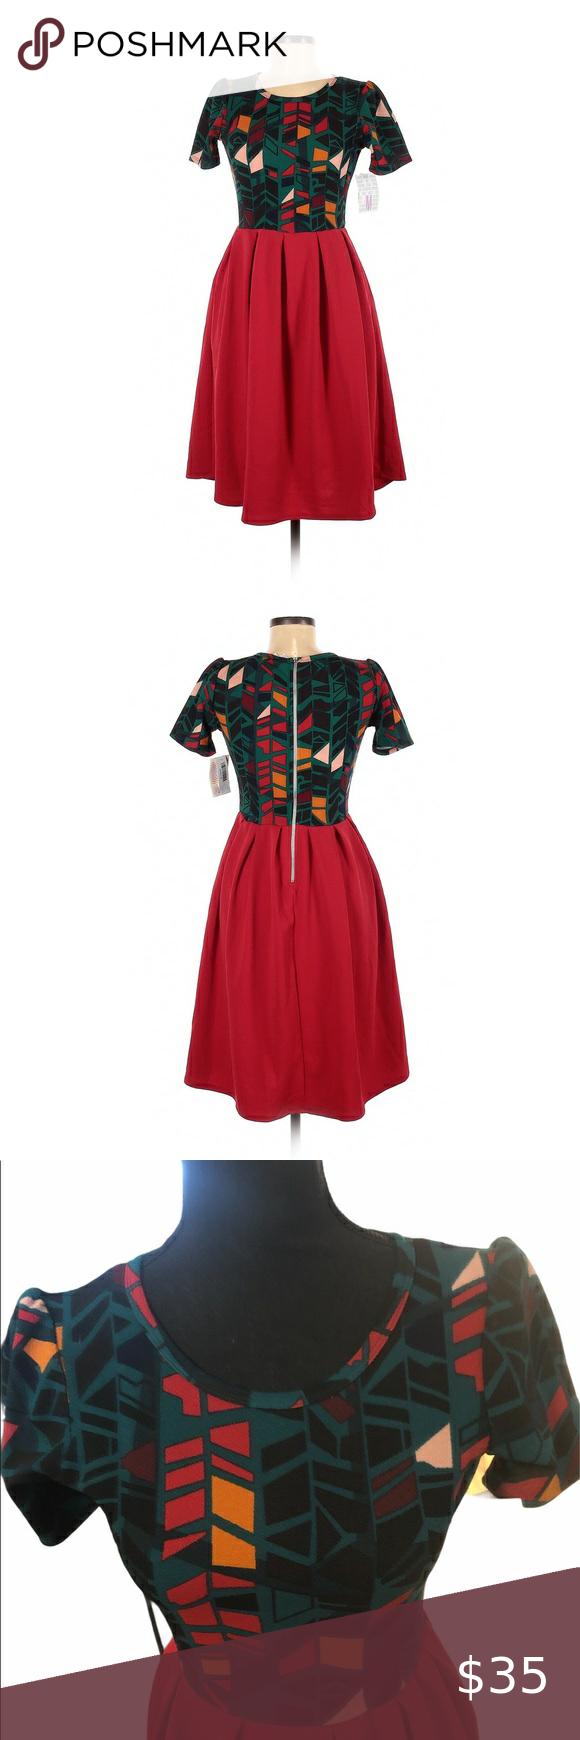 Nwt Lularoe Women S Holiday Colored Dress Xs Orange And Blue Dress Colorful Dresses Simple Black Dress [ 1740 x 580 Pixel ]